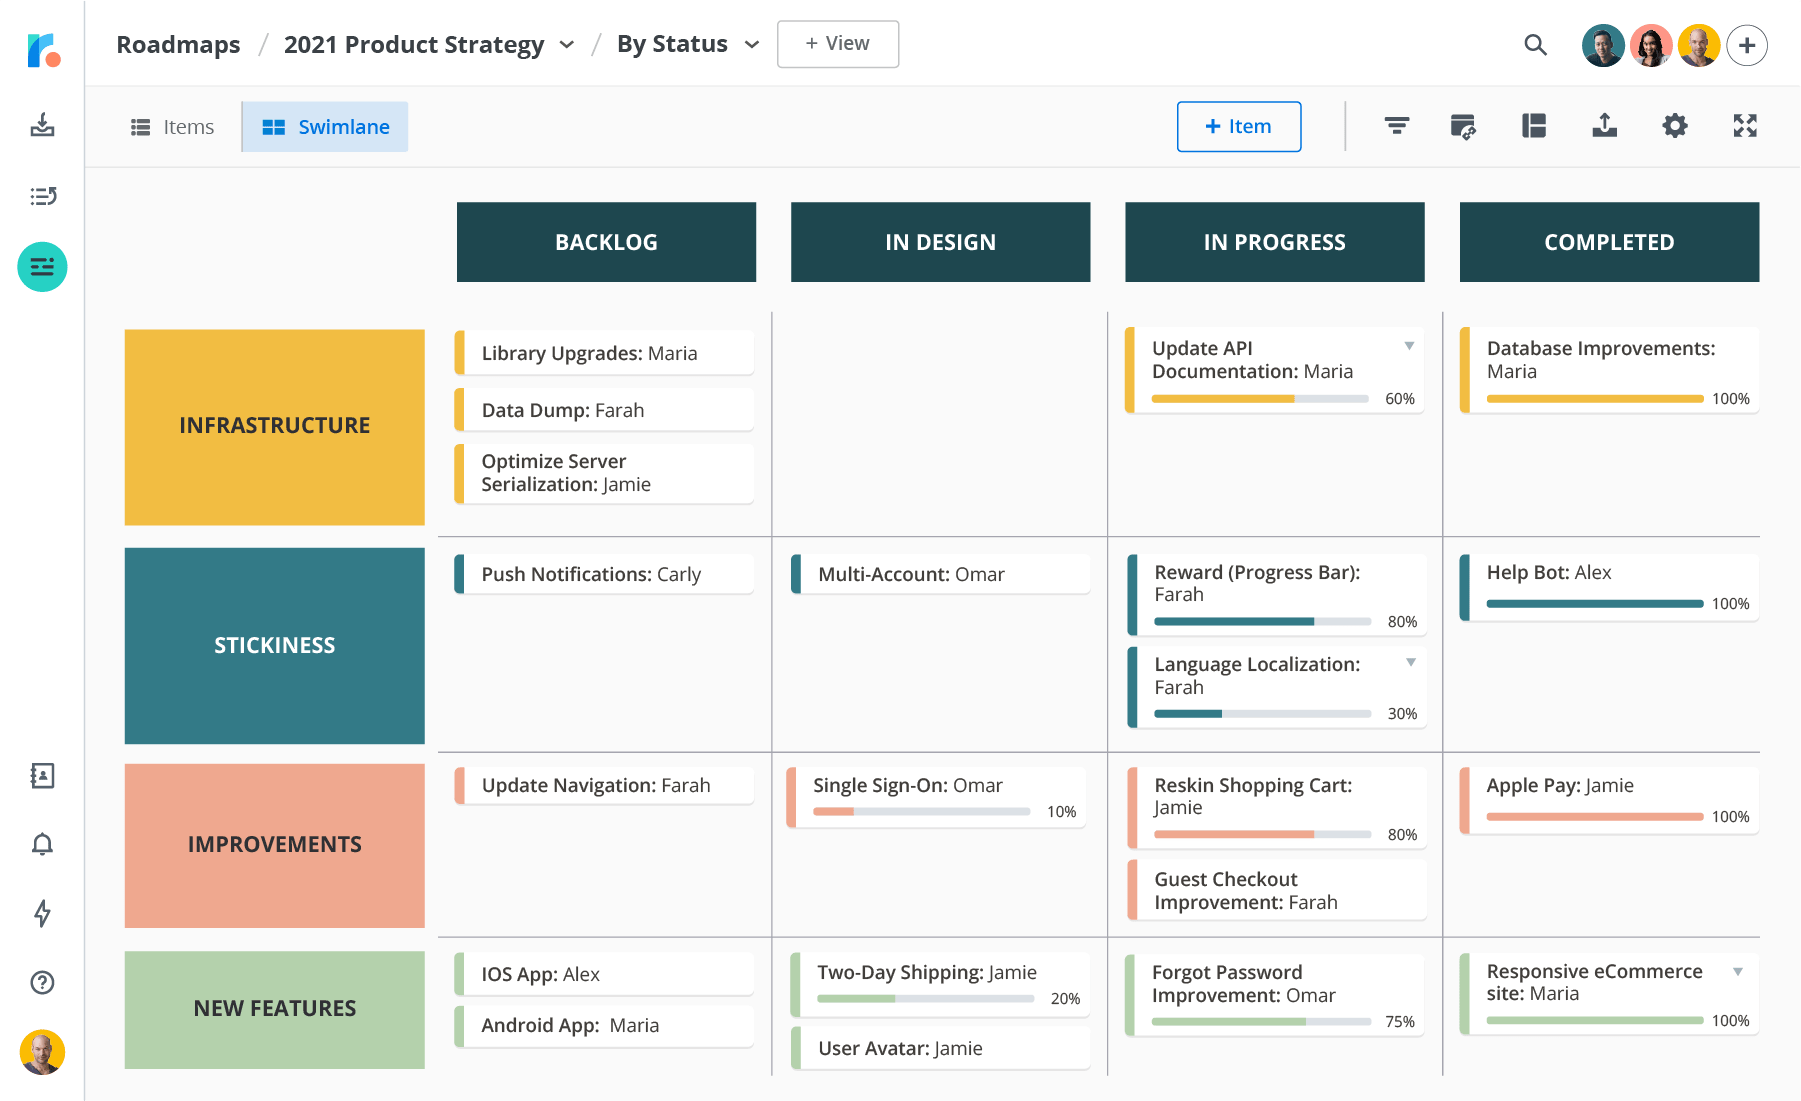 Roadmunk Product Roadmap Software & Roadmap Tool